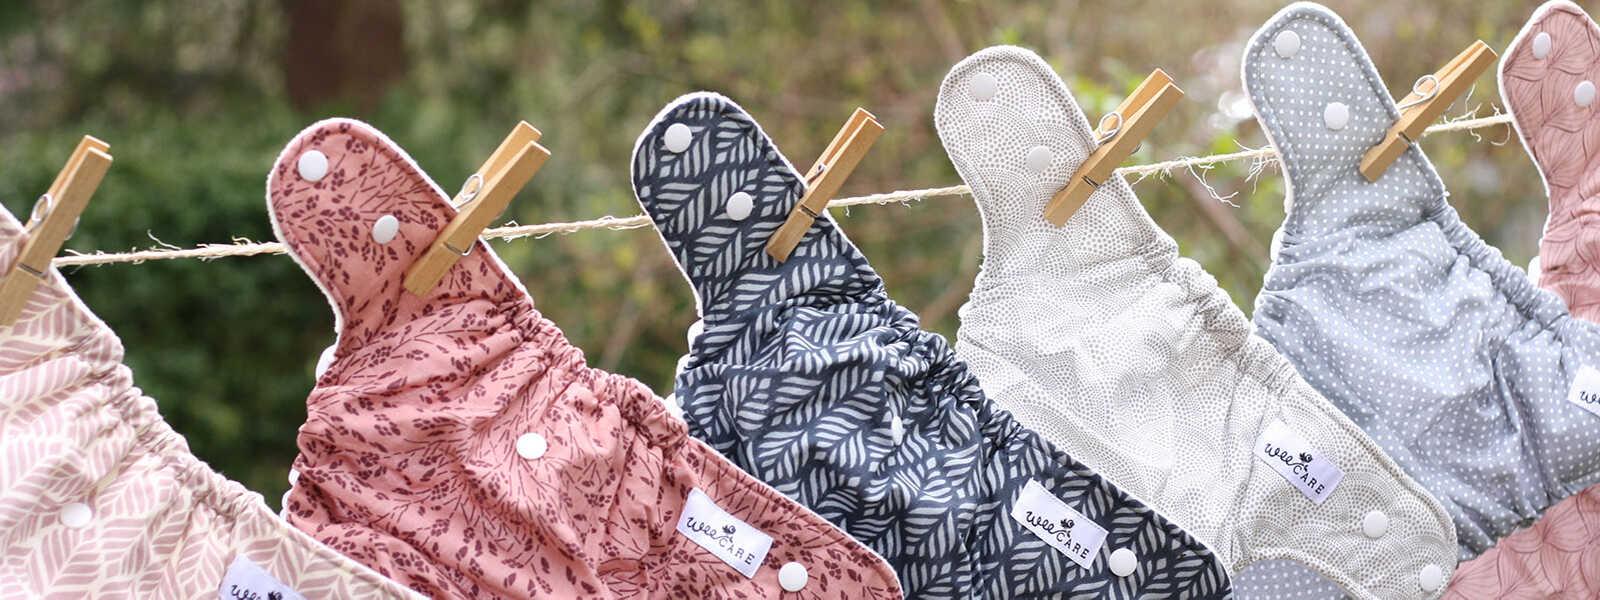 environmentally-modern-cloth-diapers-weecare